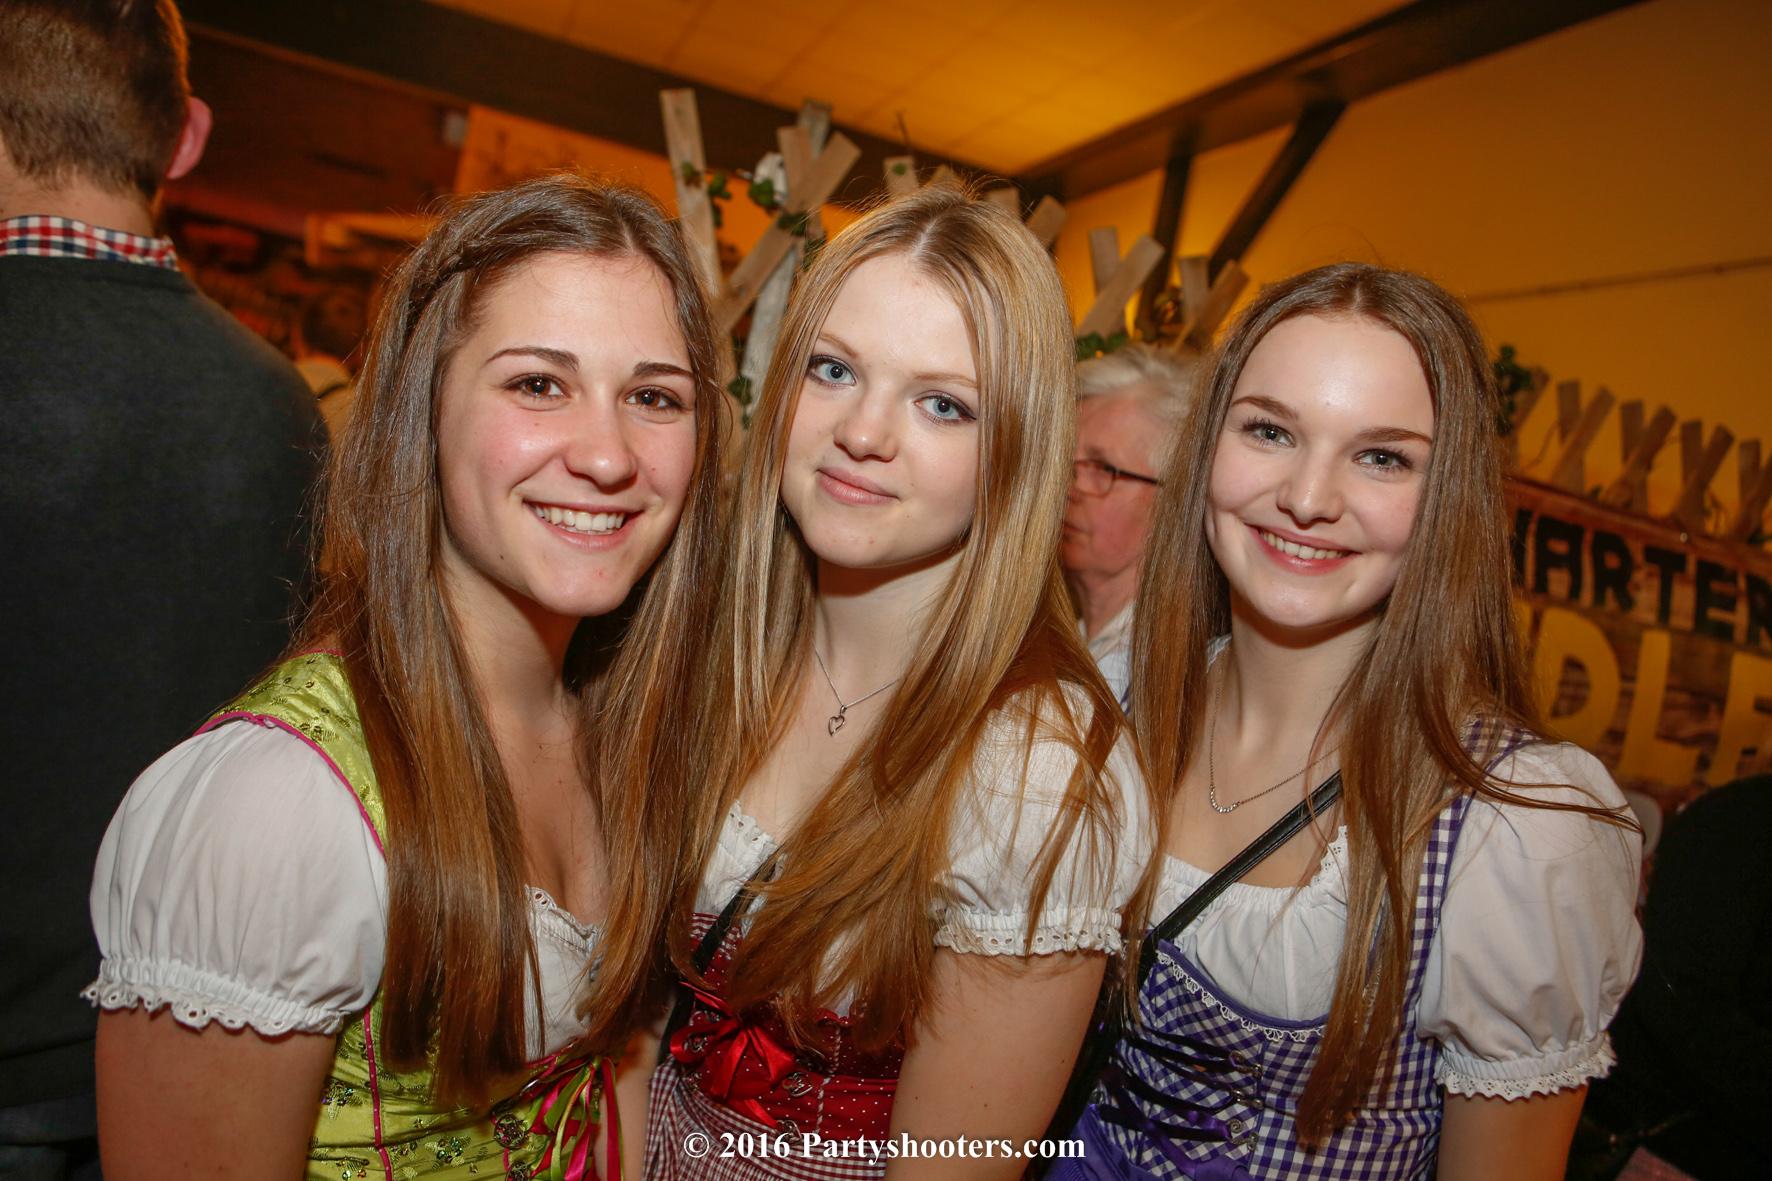 0103 - 4049 - Fruehlingsball Aspach